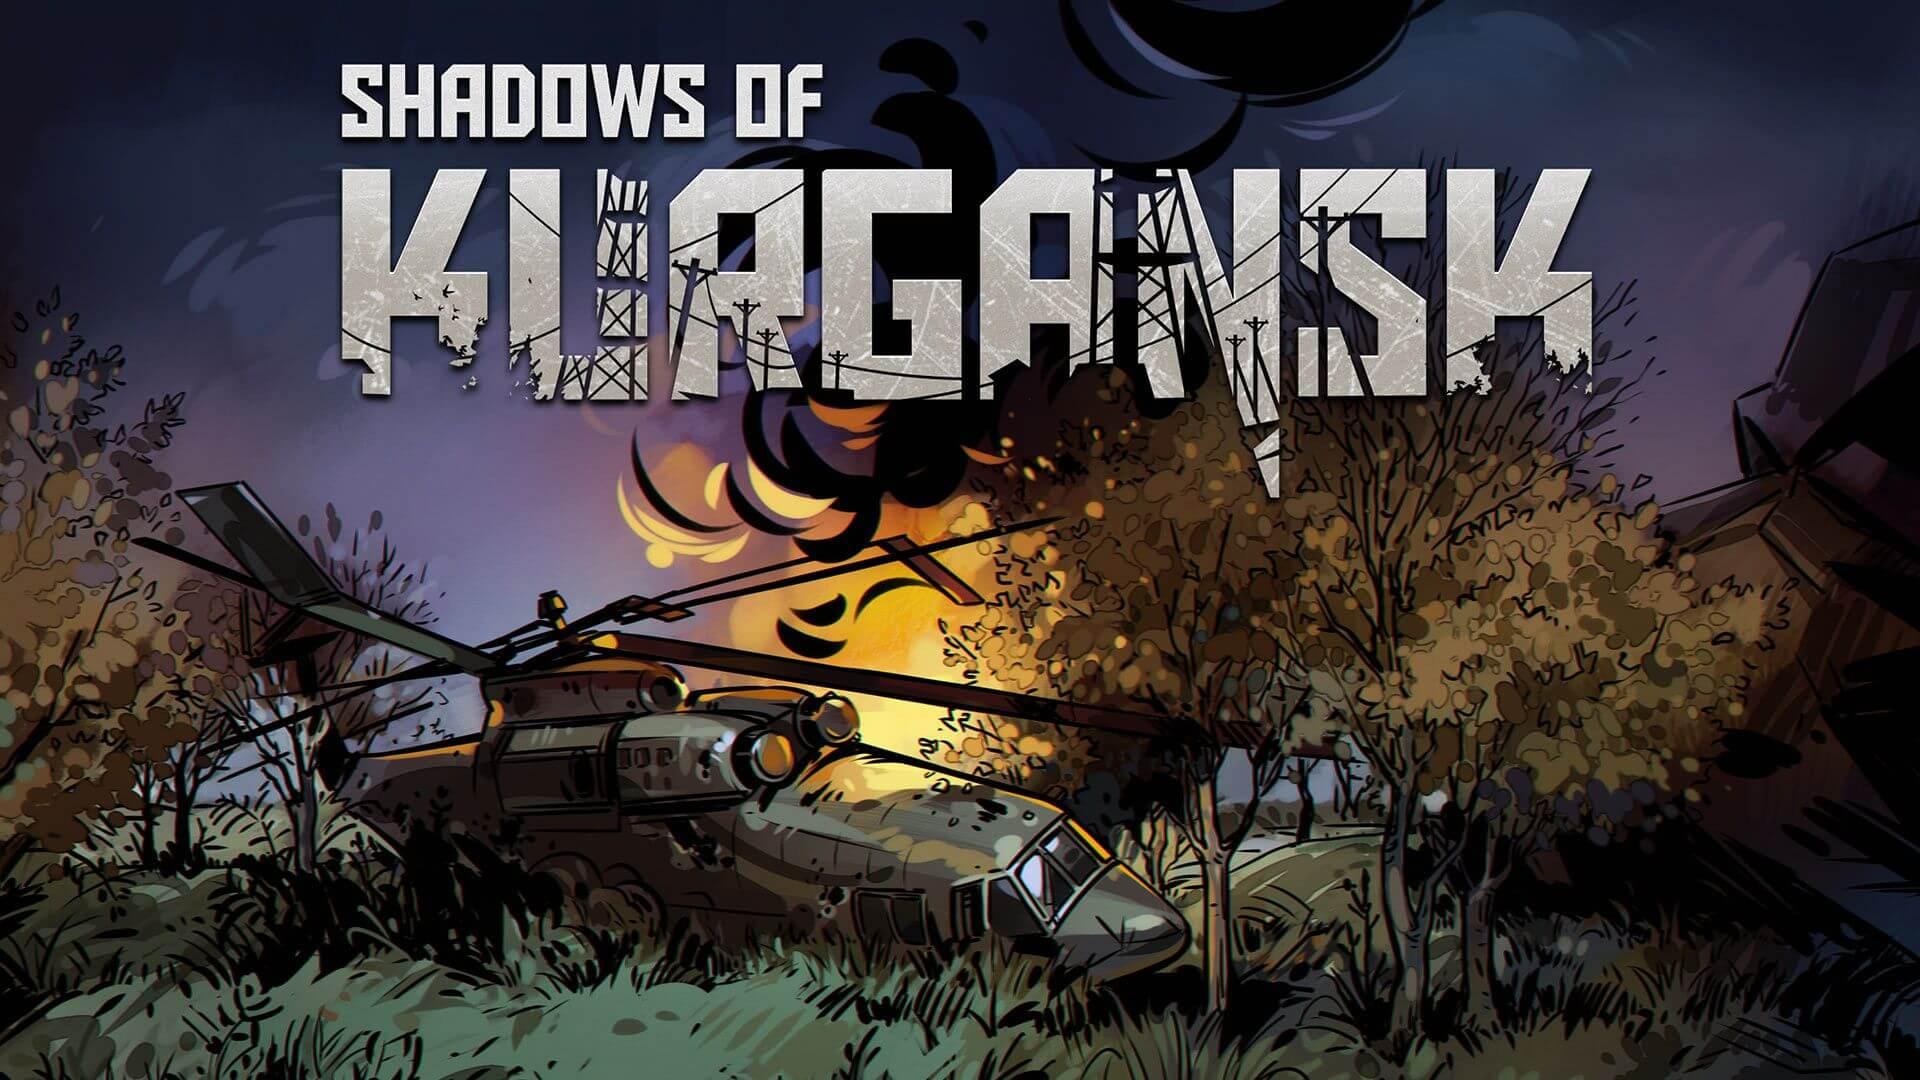 Shadows of Kurgansk key art